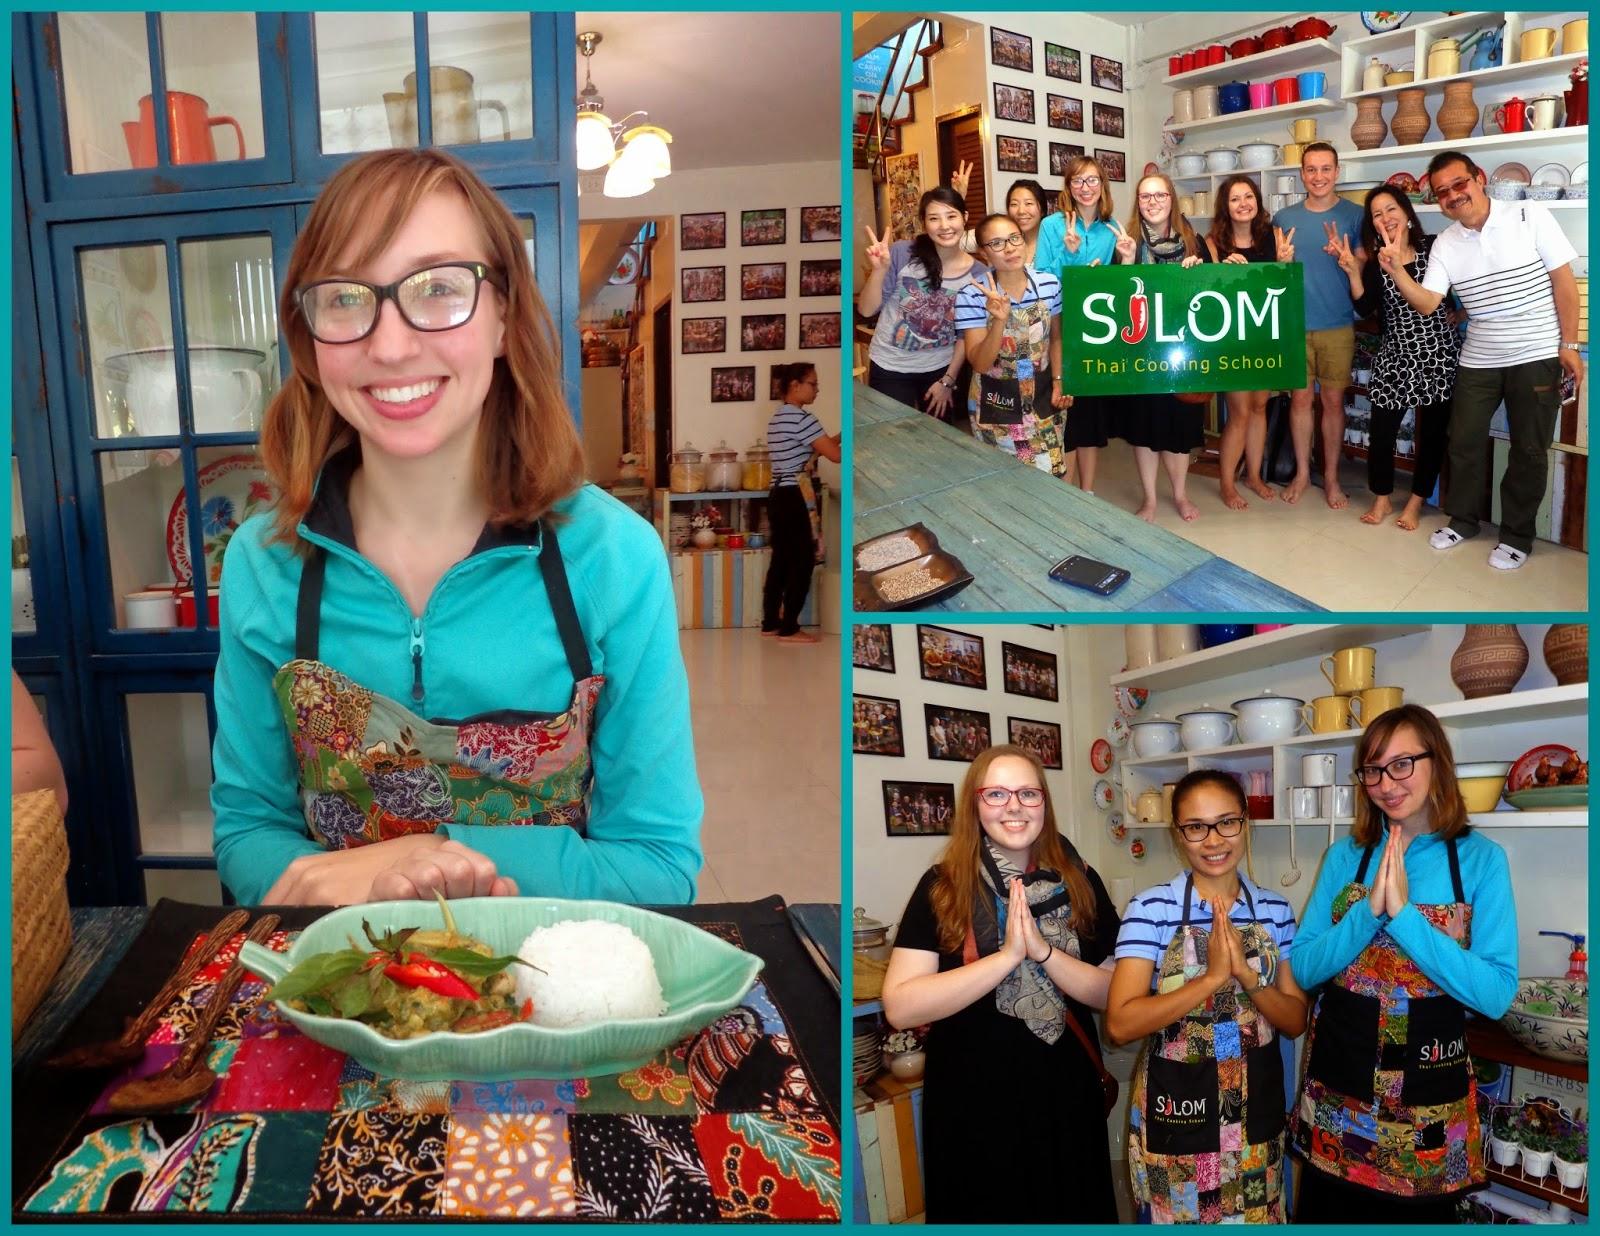 Silom Thai Cooking School in Bangkok